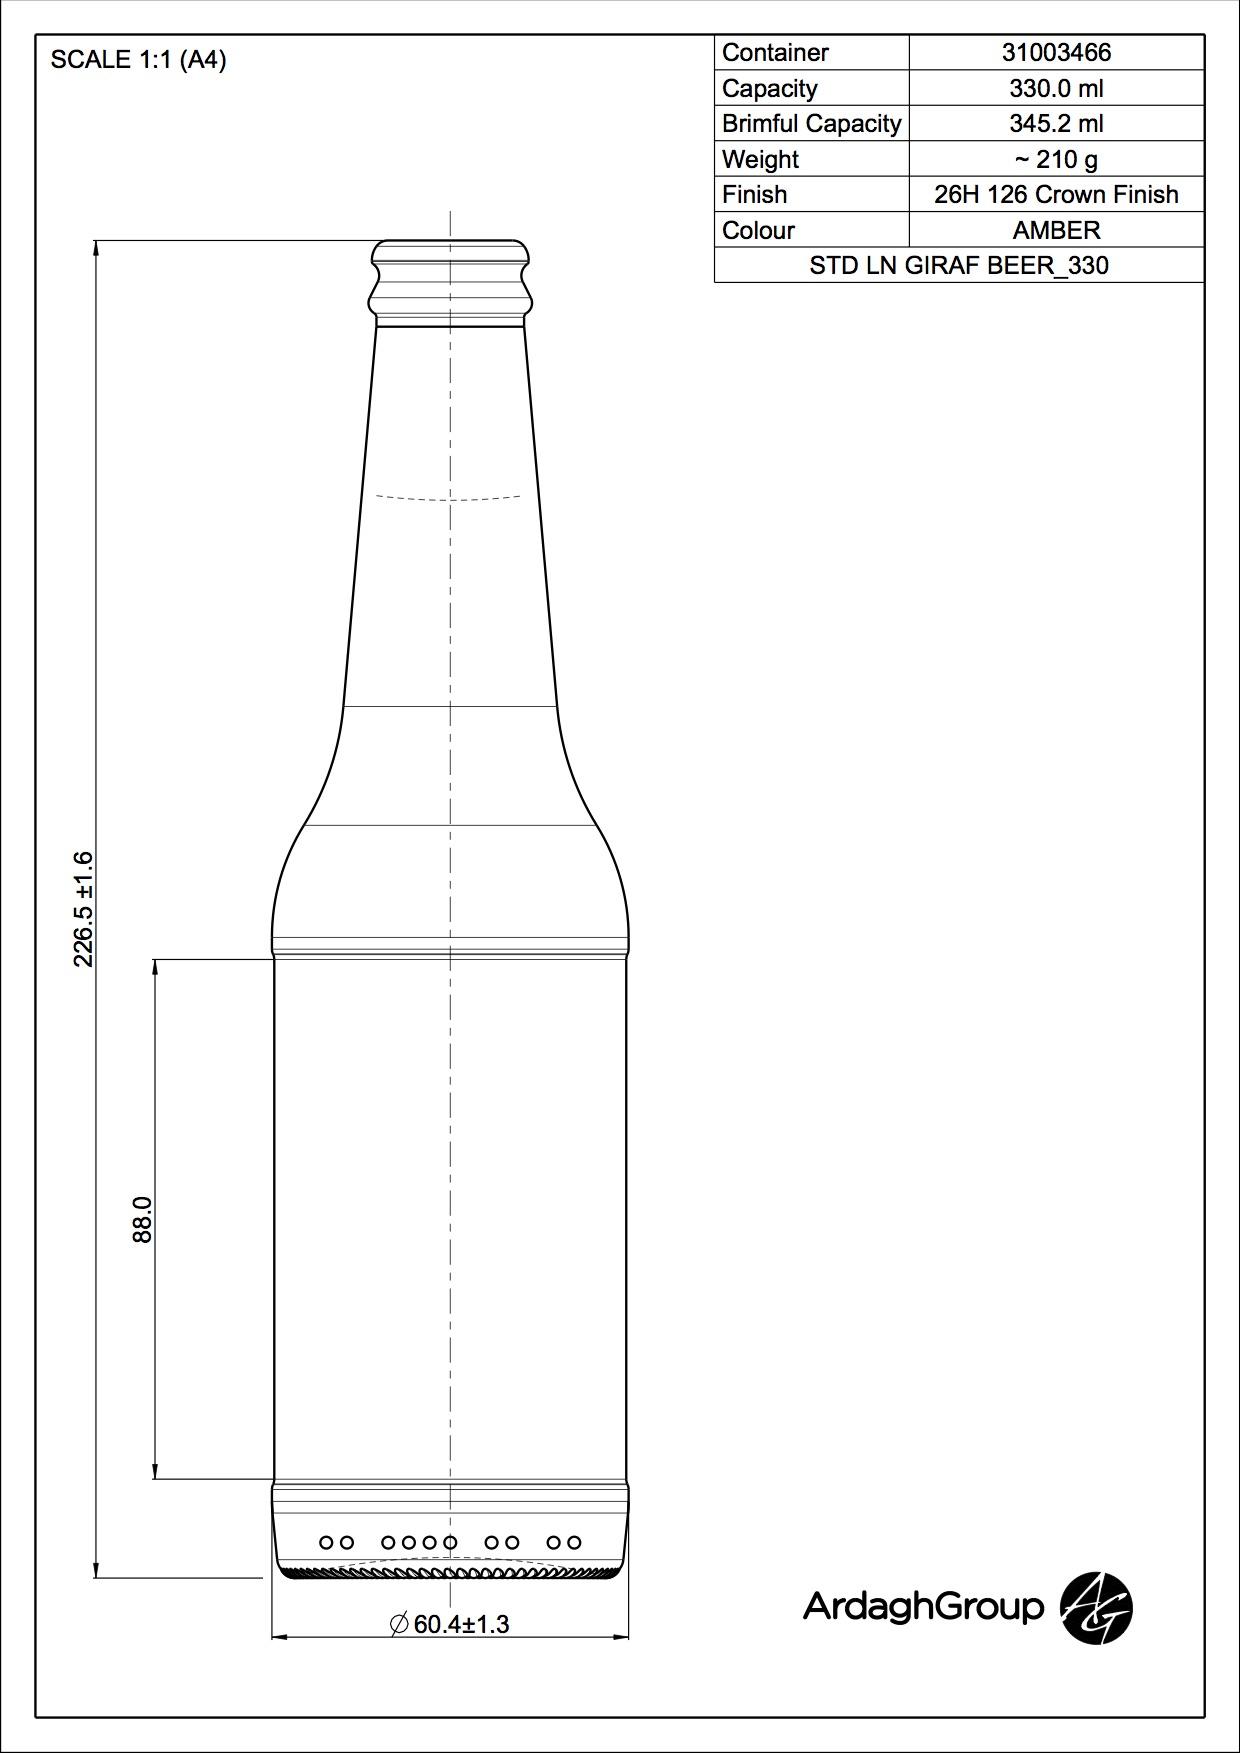 330ml amber glass Longneck Giraf oneway beer bottle